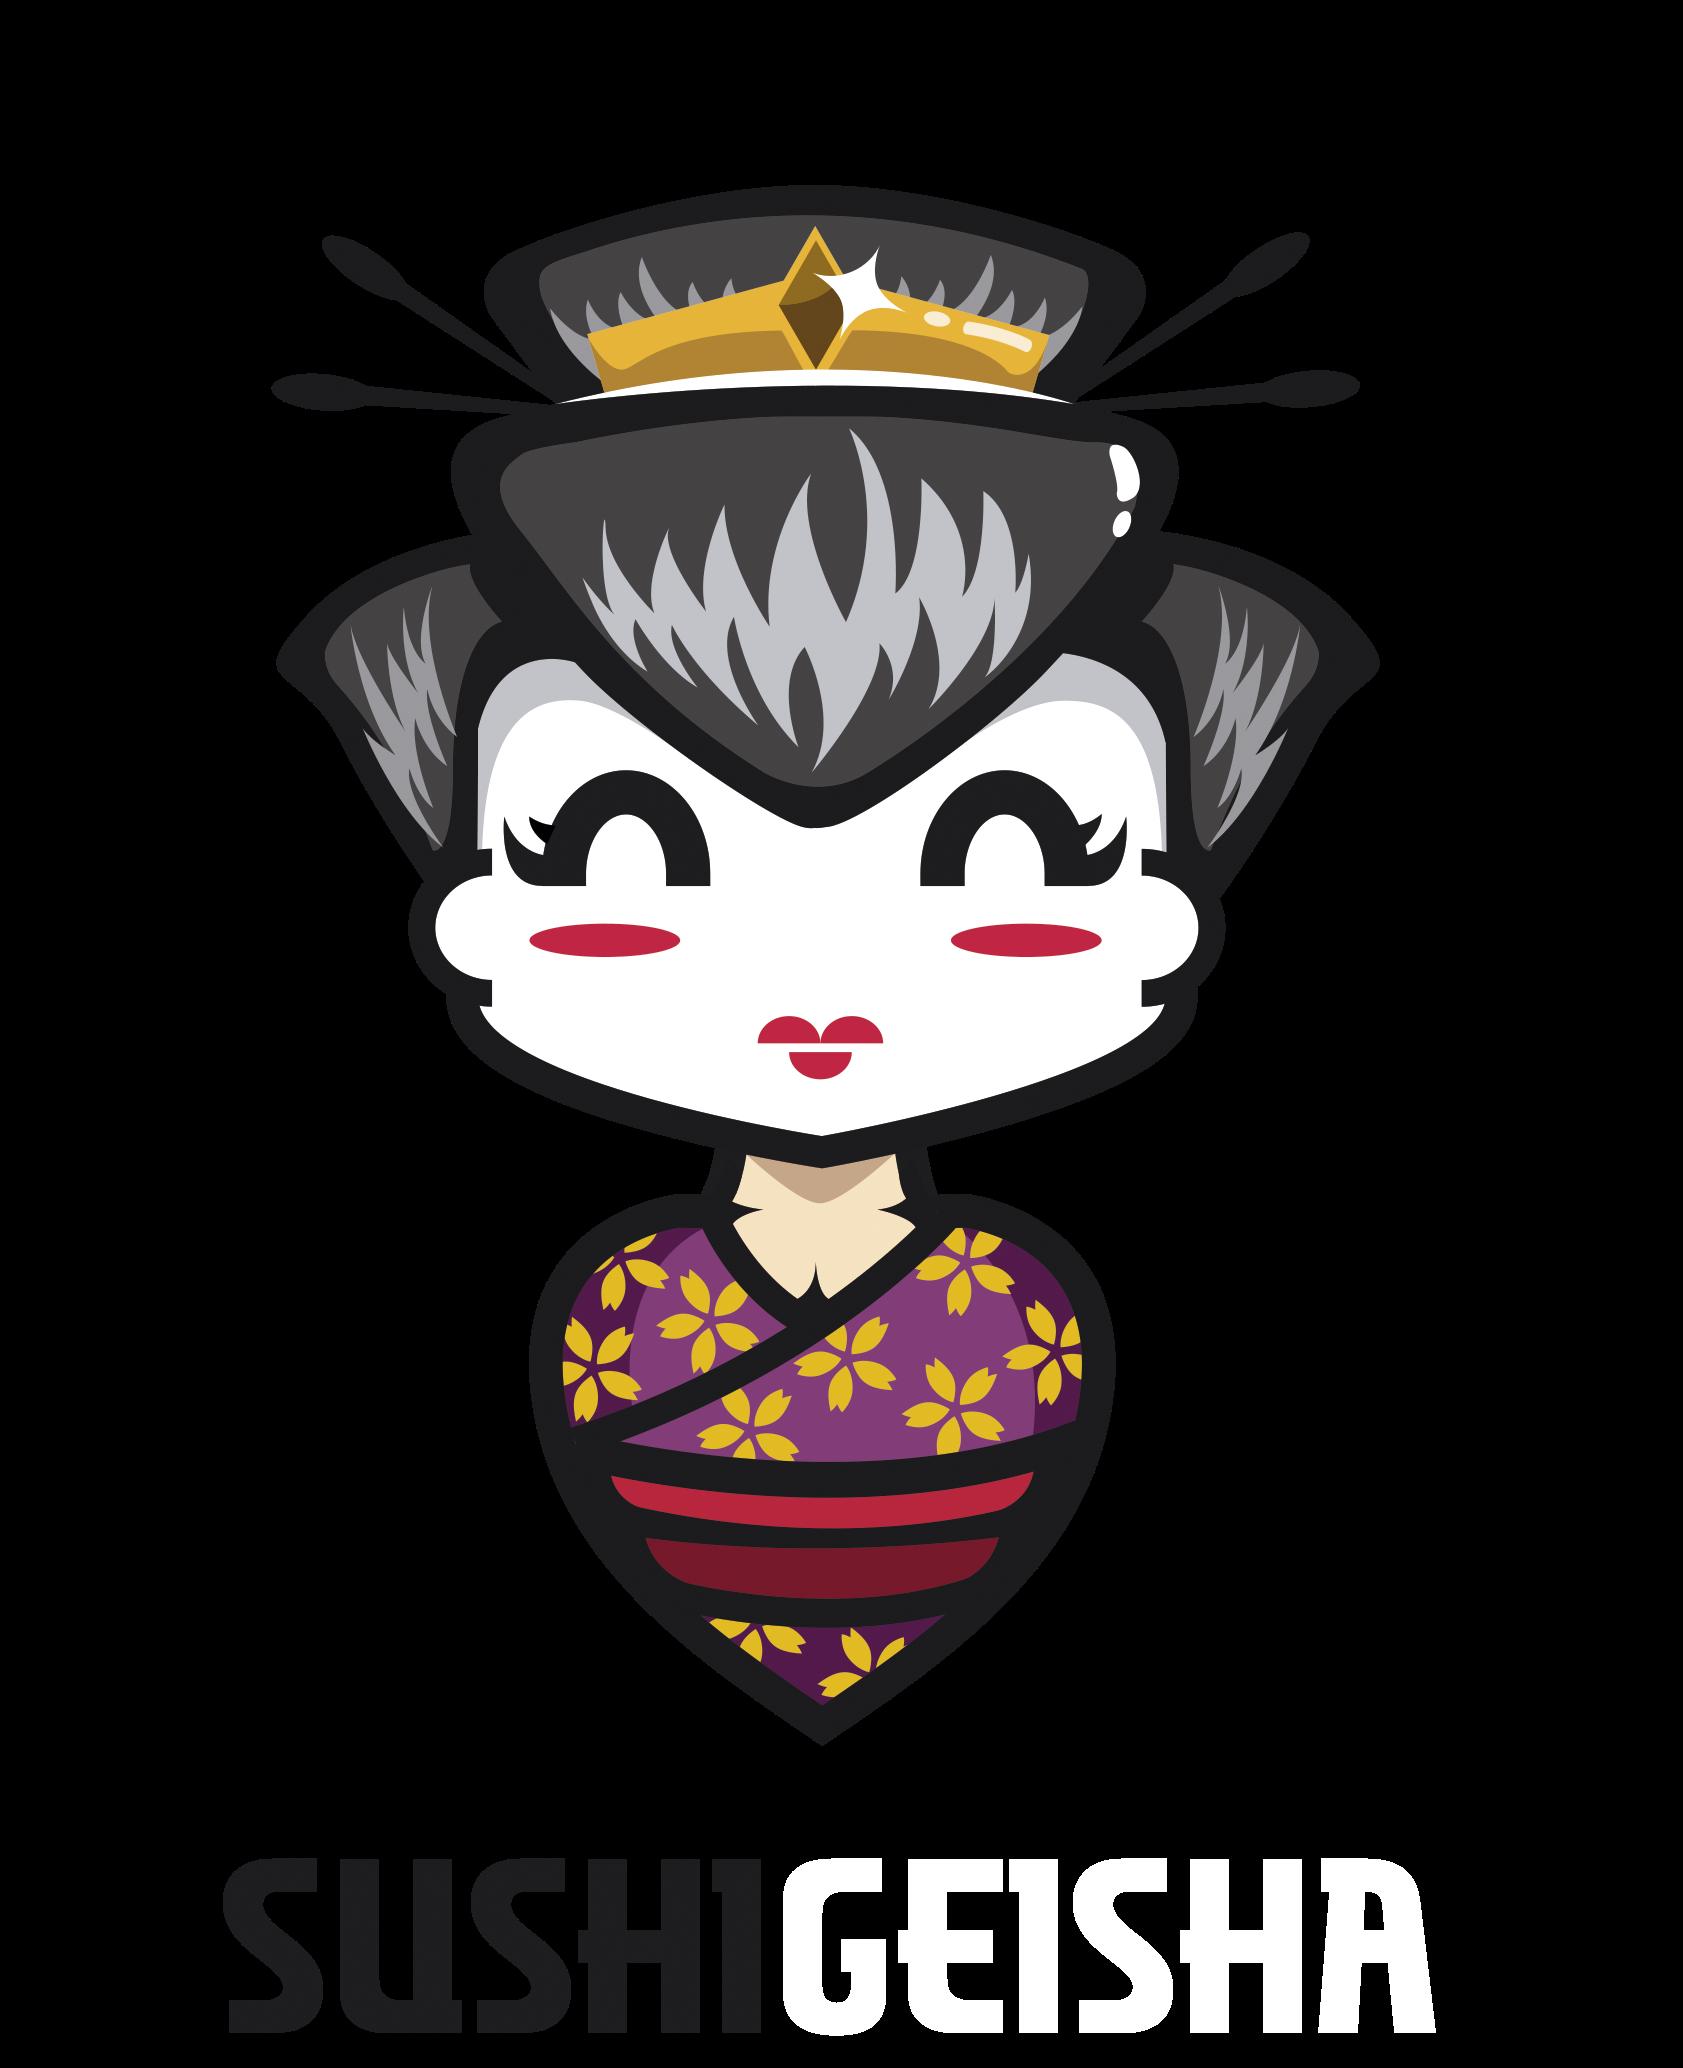 Sushi Geisha Logo PNG